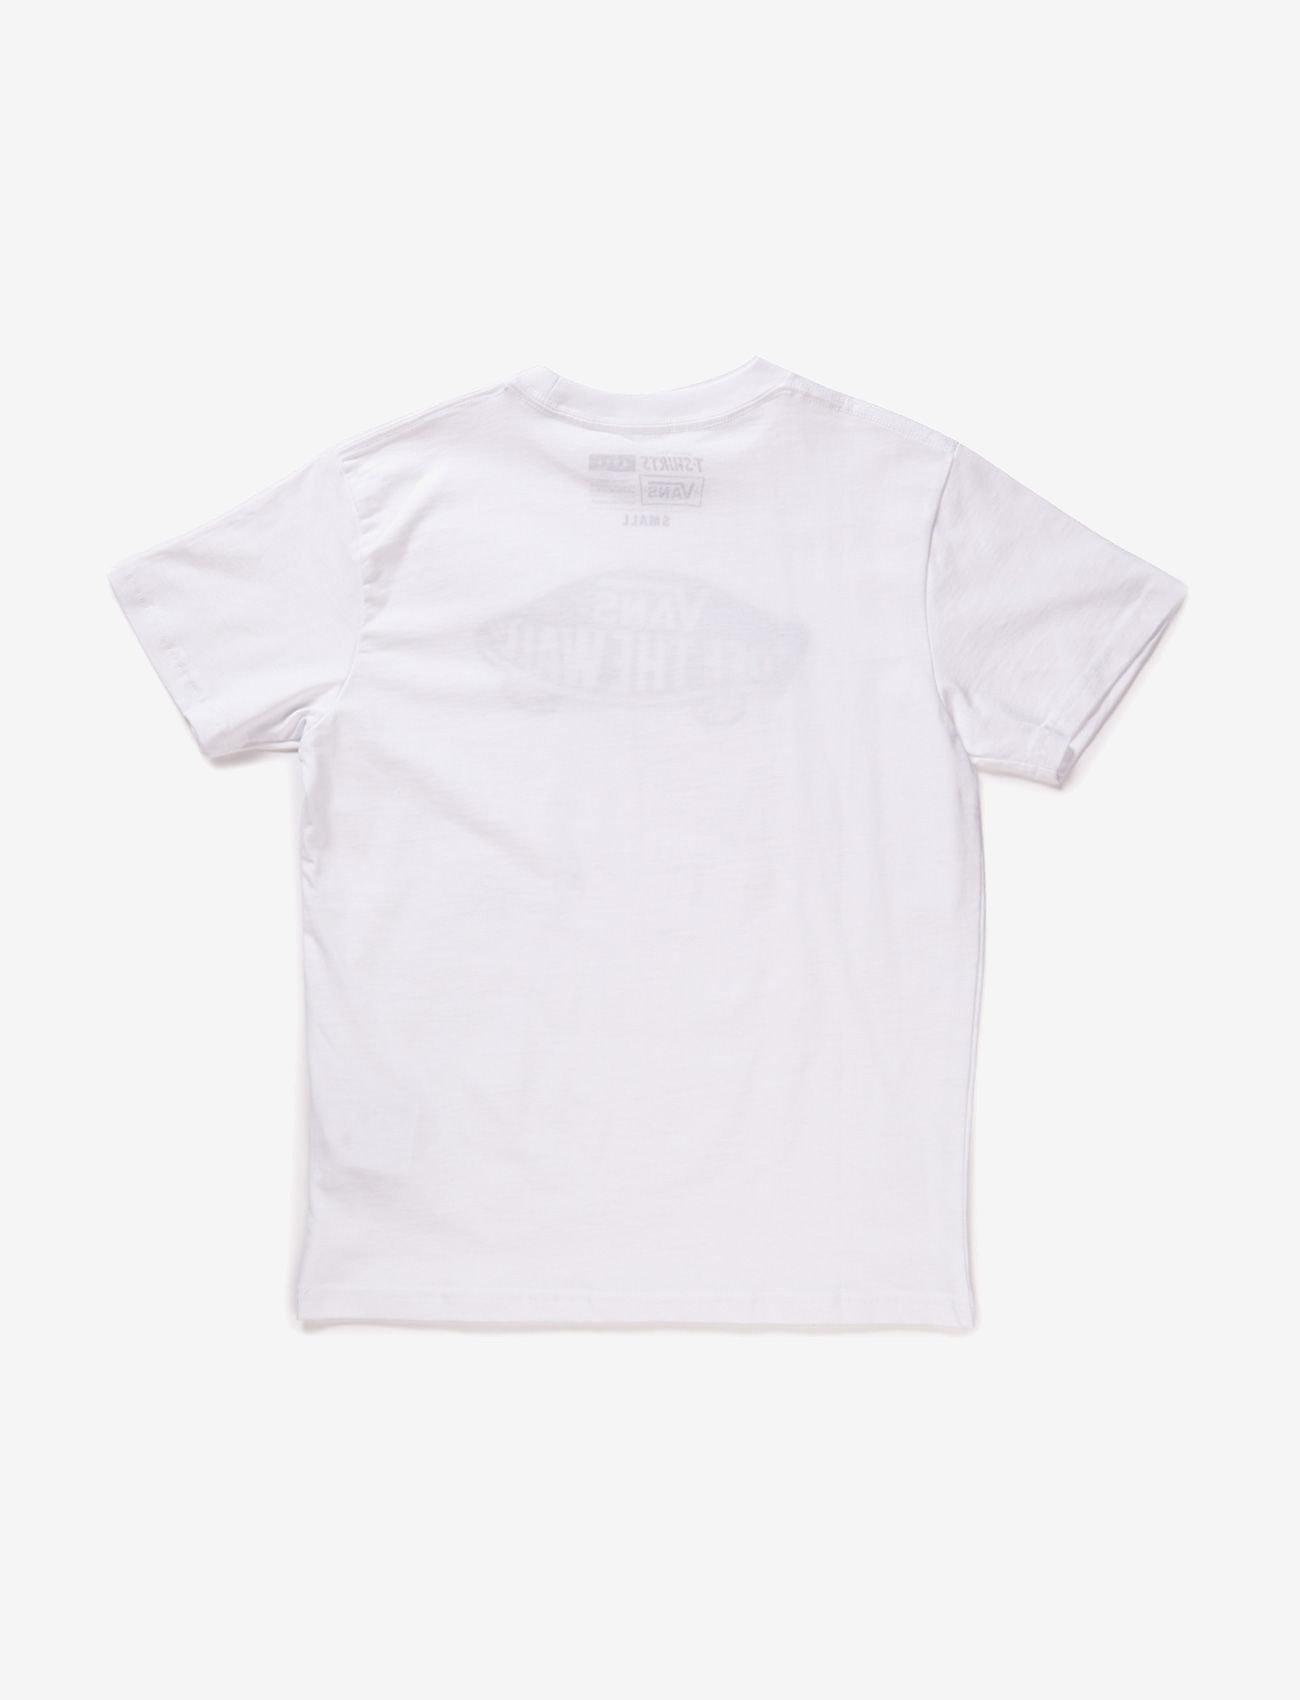 VANS - OTW BOYS - kurzärmelige - white/black - 1